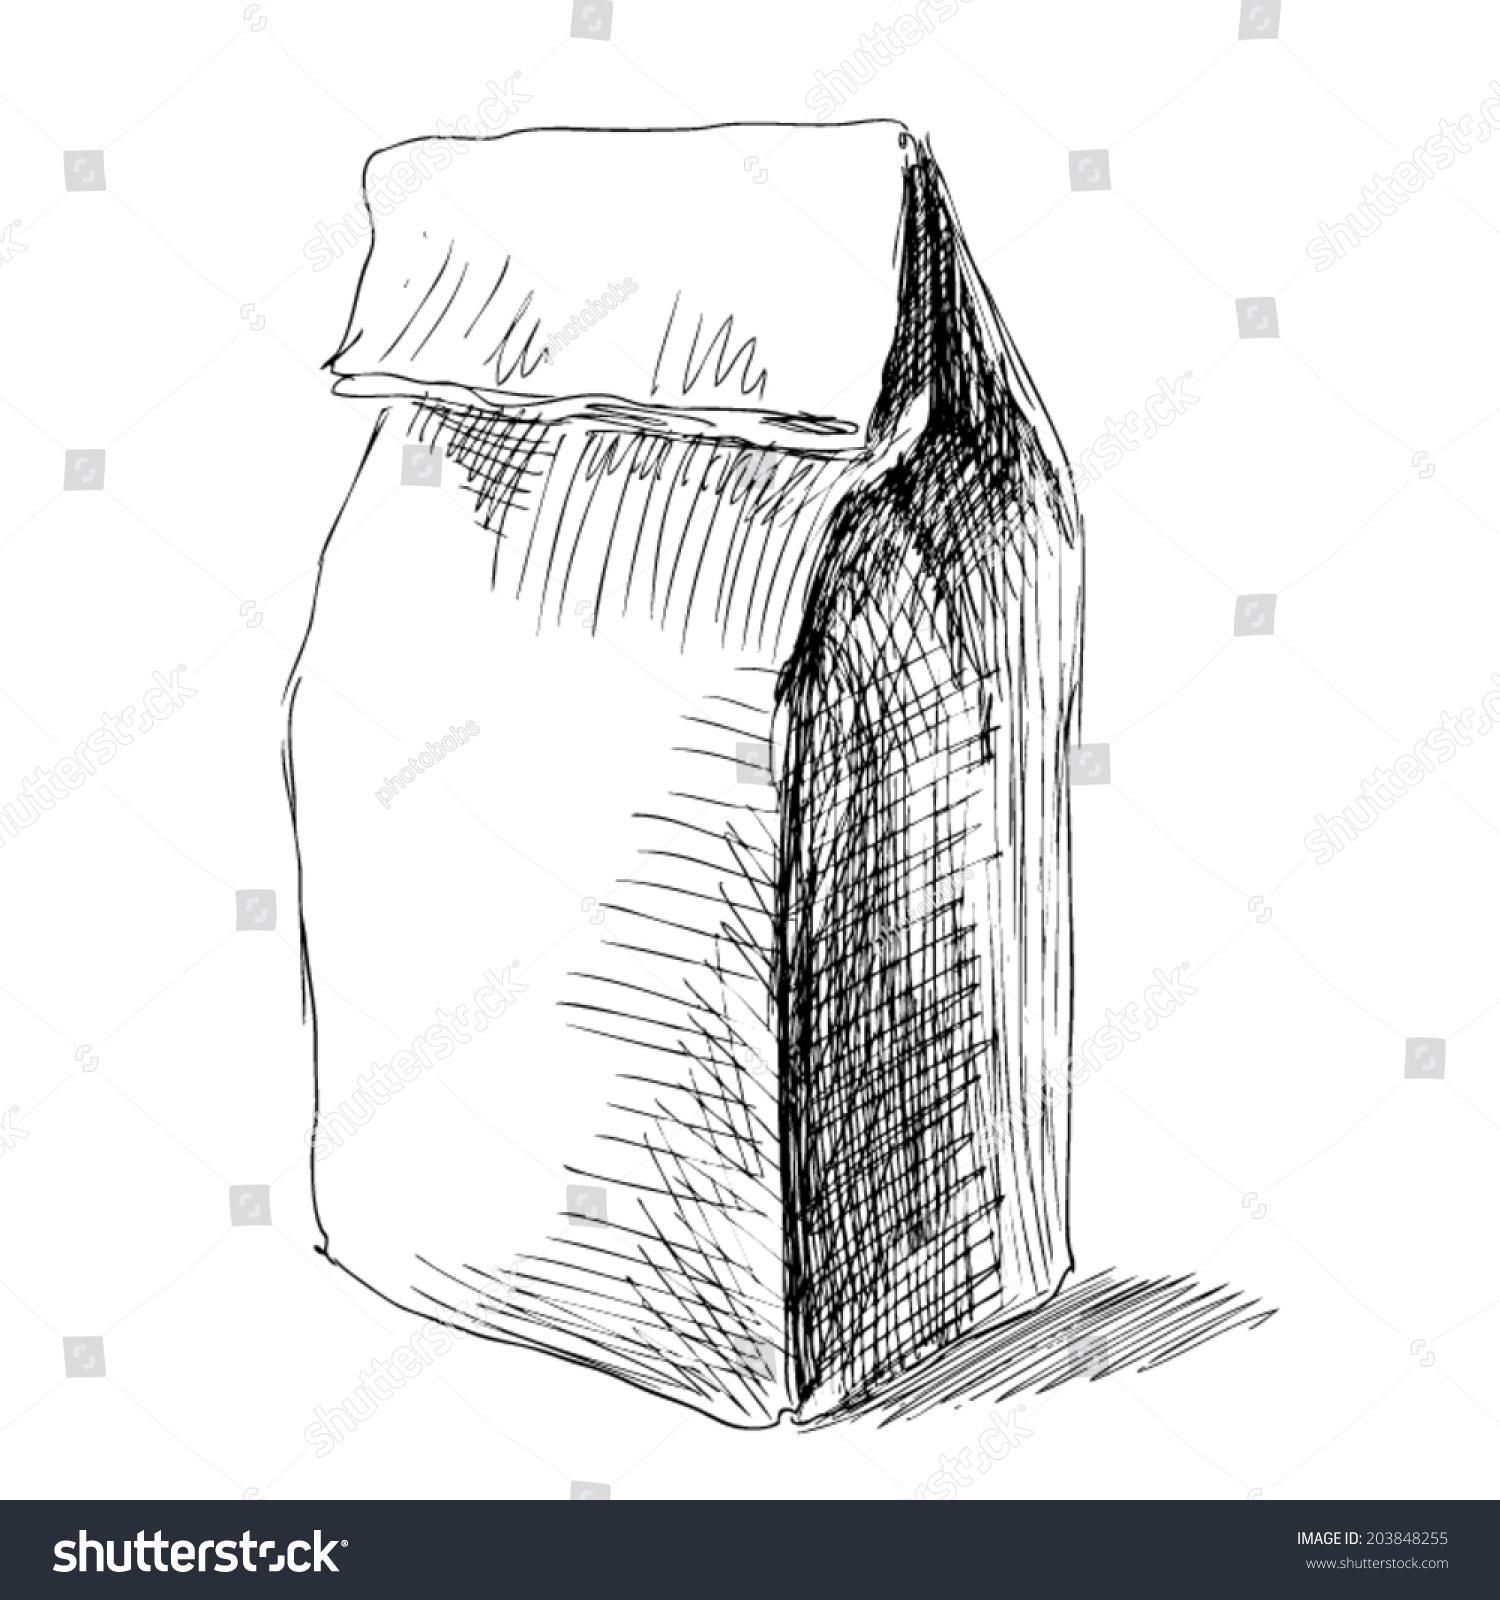 Paper bag sketch -